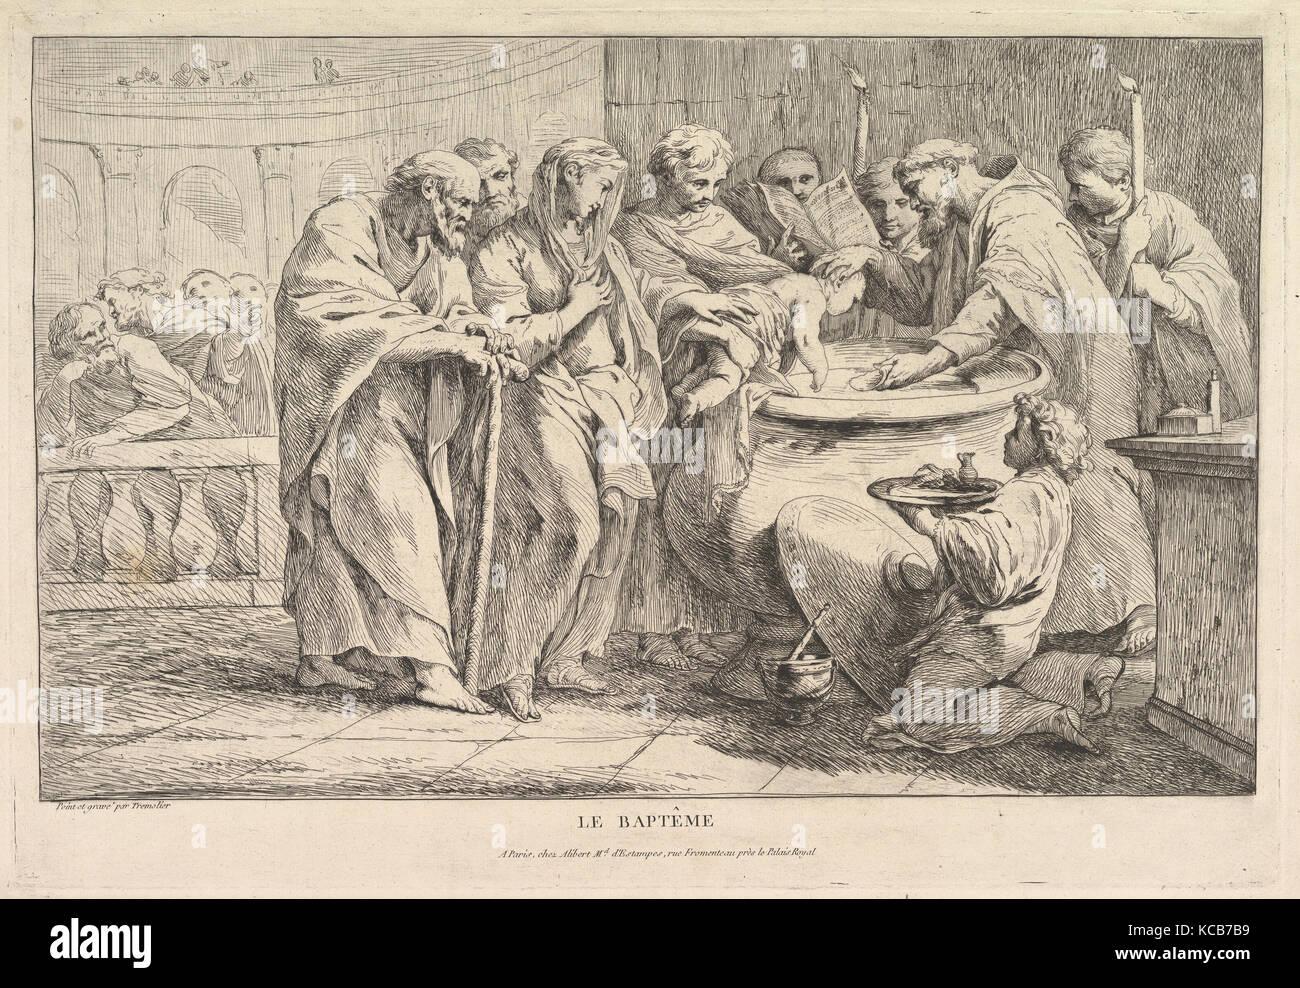 El bautismo, ca. 1734, aguafuerte, estado II/II, Hoja: 13 1/4 x 19 1/16 in. (33,7 x 48,4 cm), imprime, Pierre Charles Trémolières Foto de stock